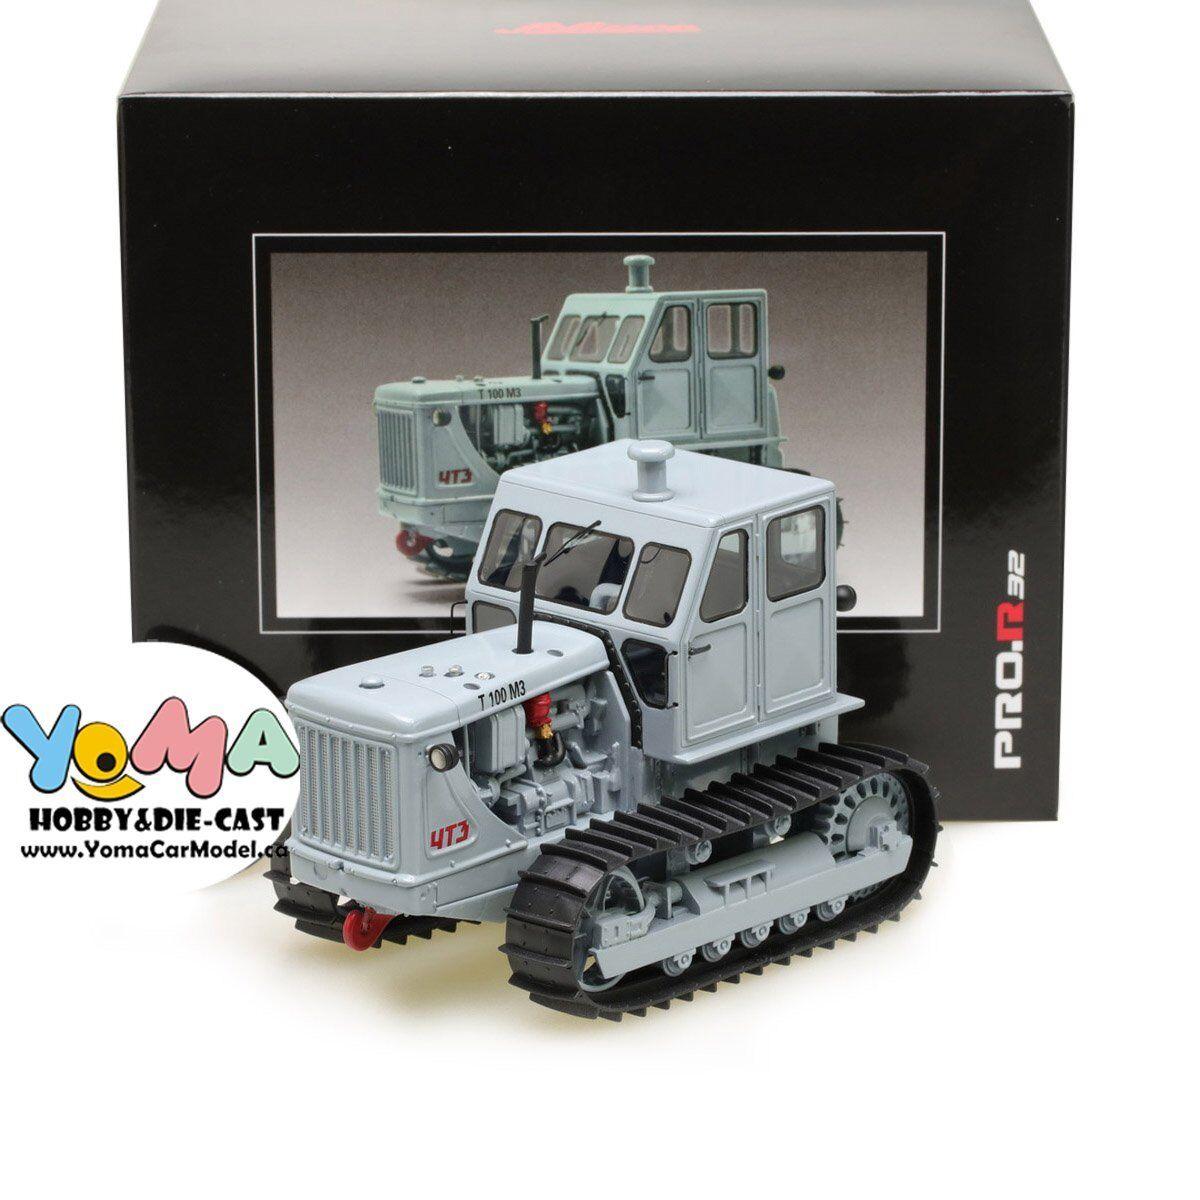 Schuco 1 32 Ketentraktor T100 M3 Tractor Resin 450901800